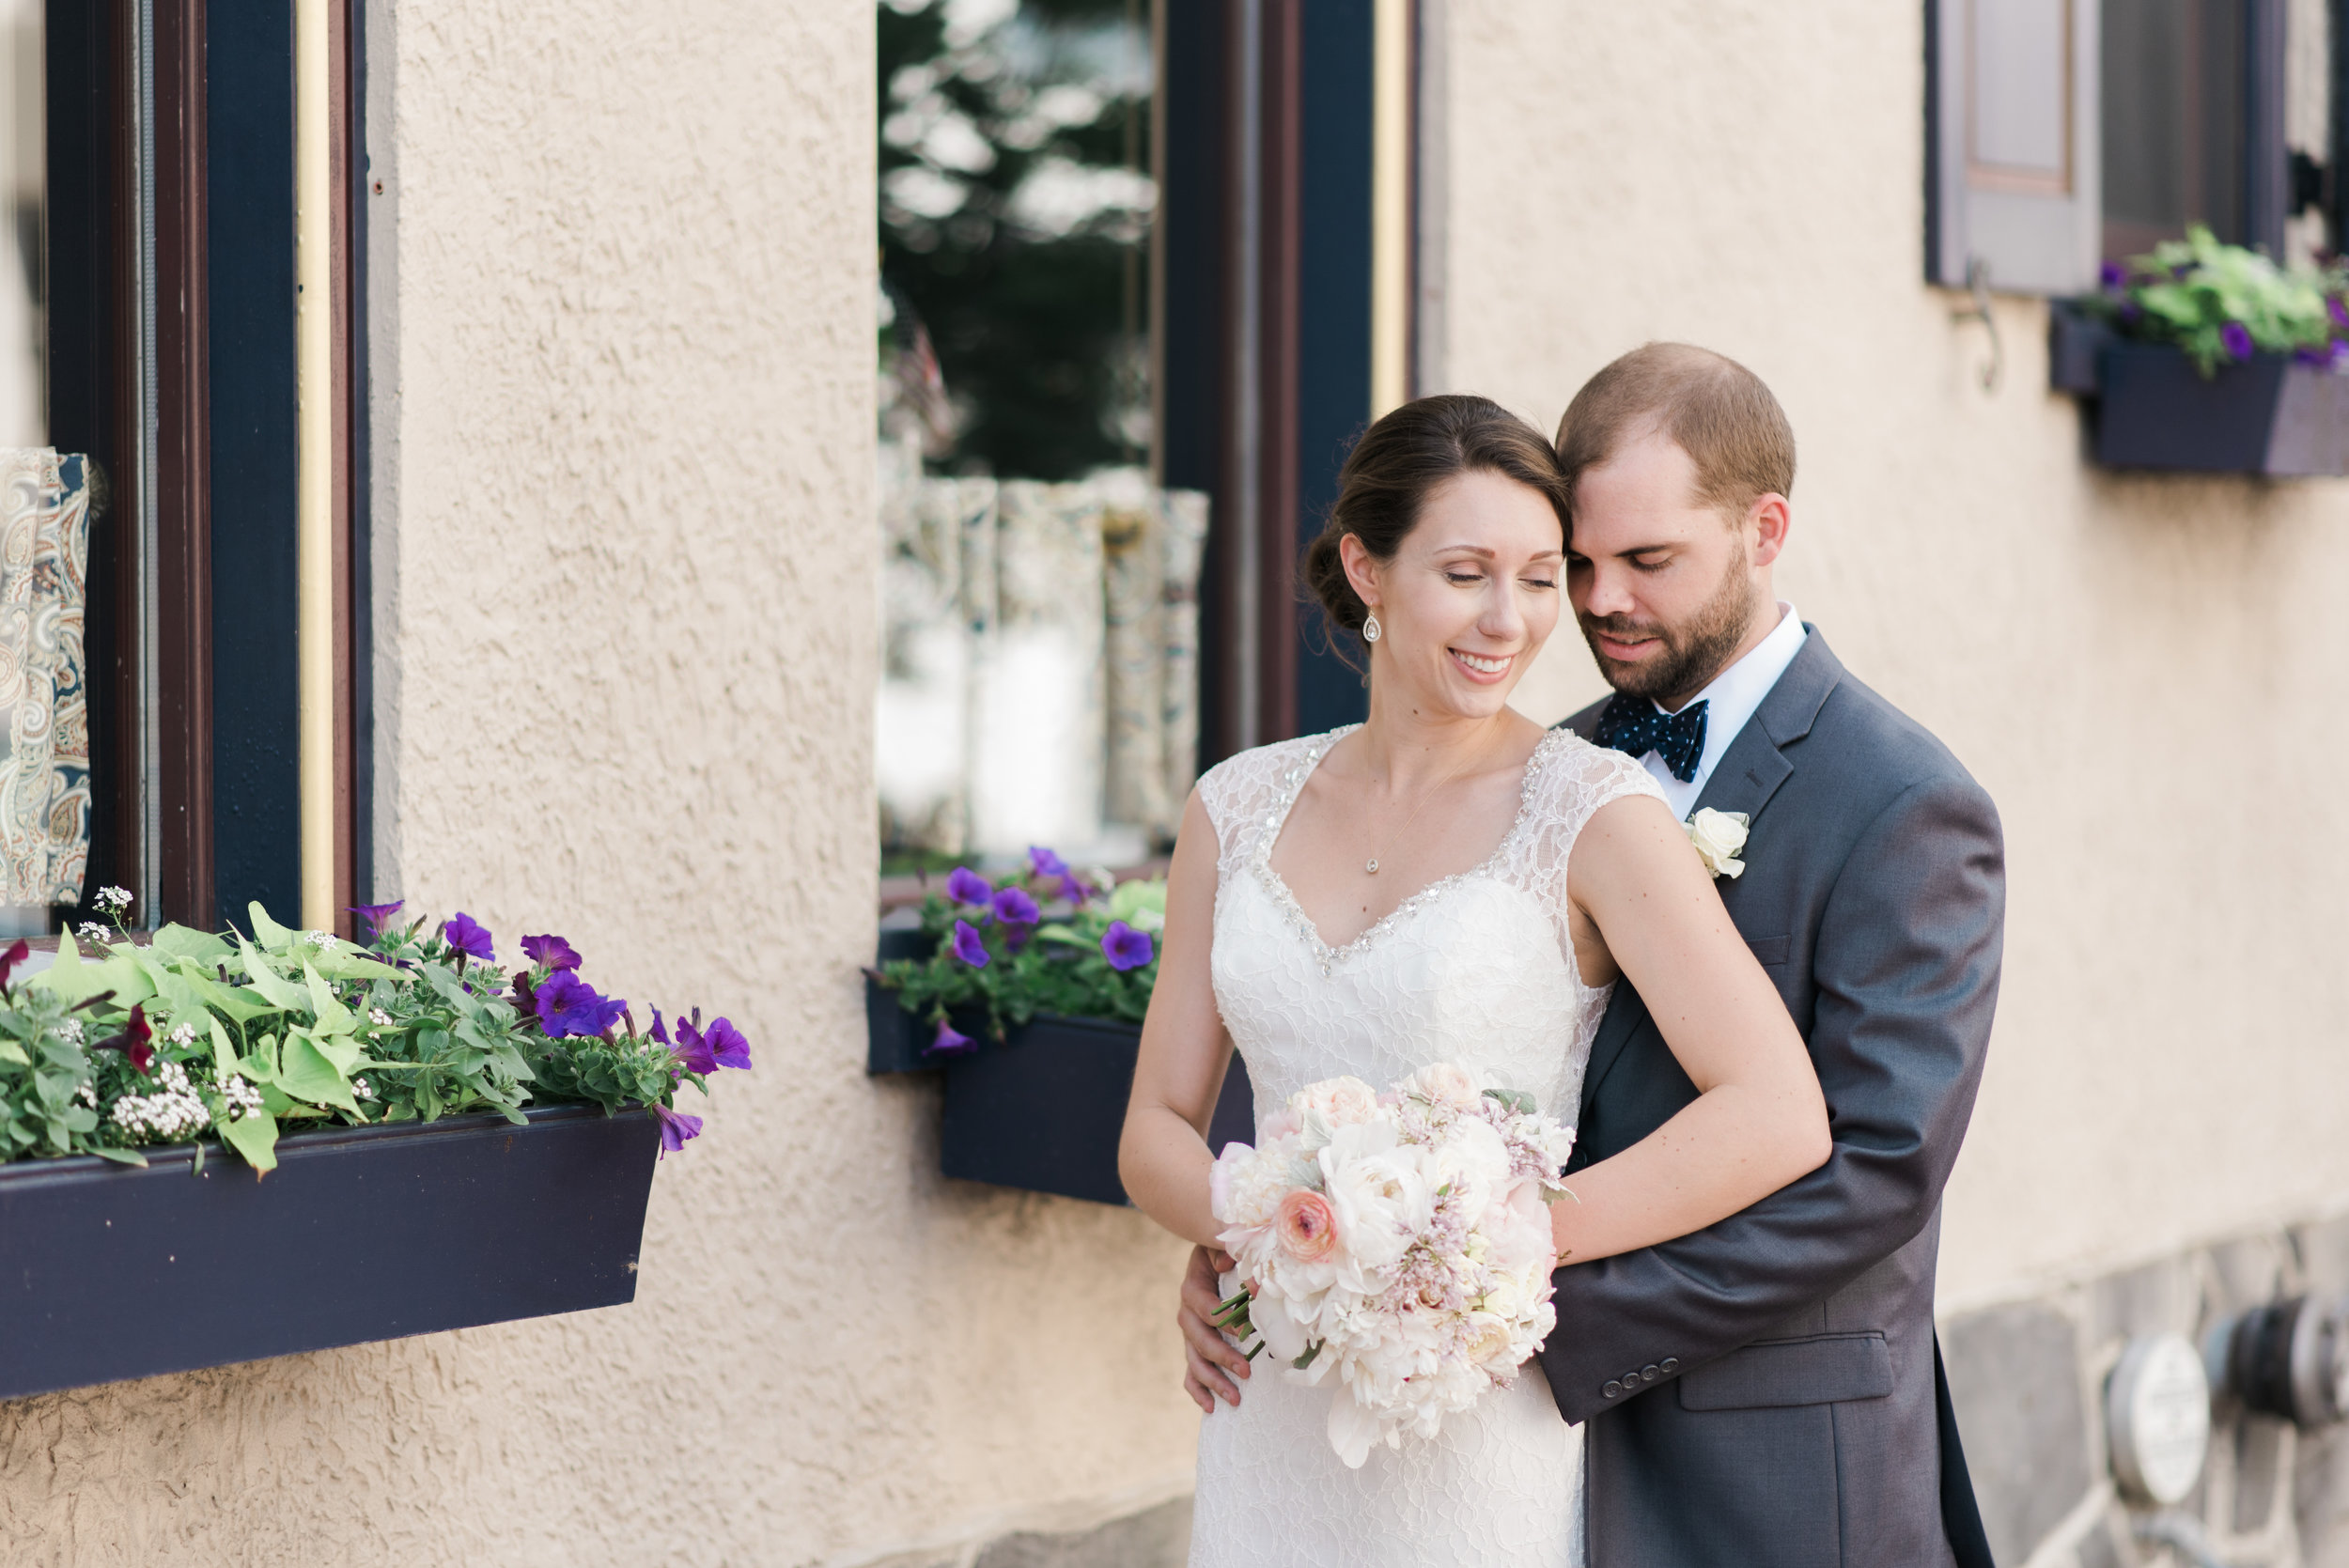 Mccoy-Emmett Wedding-130.jpg